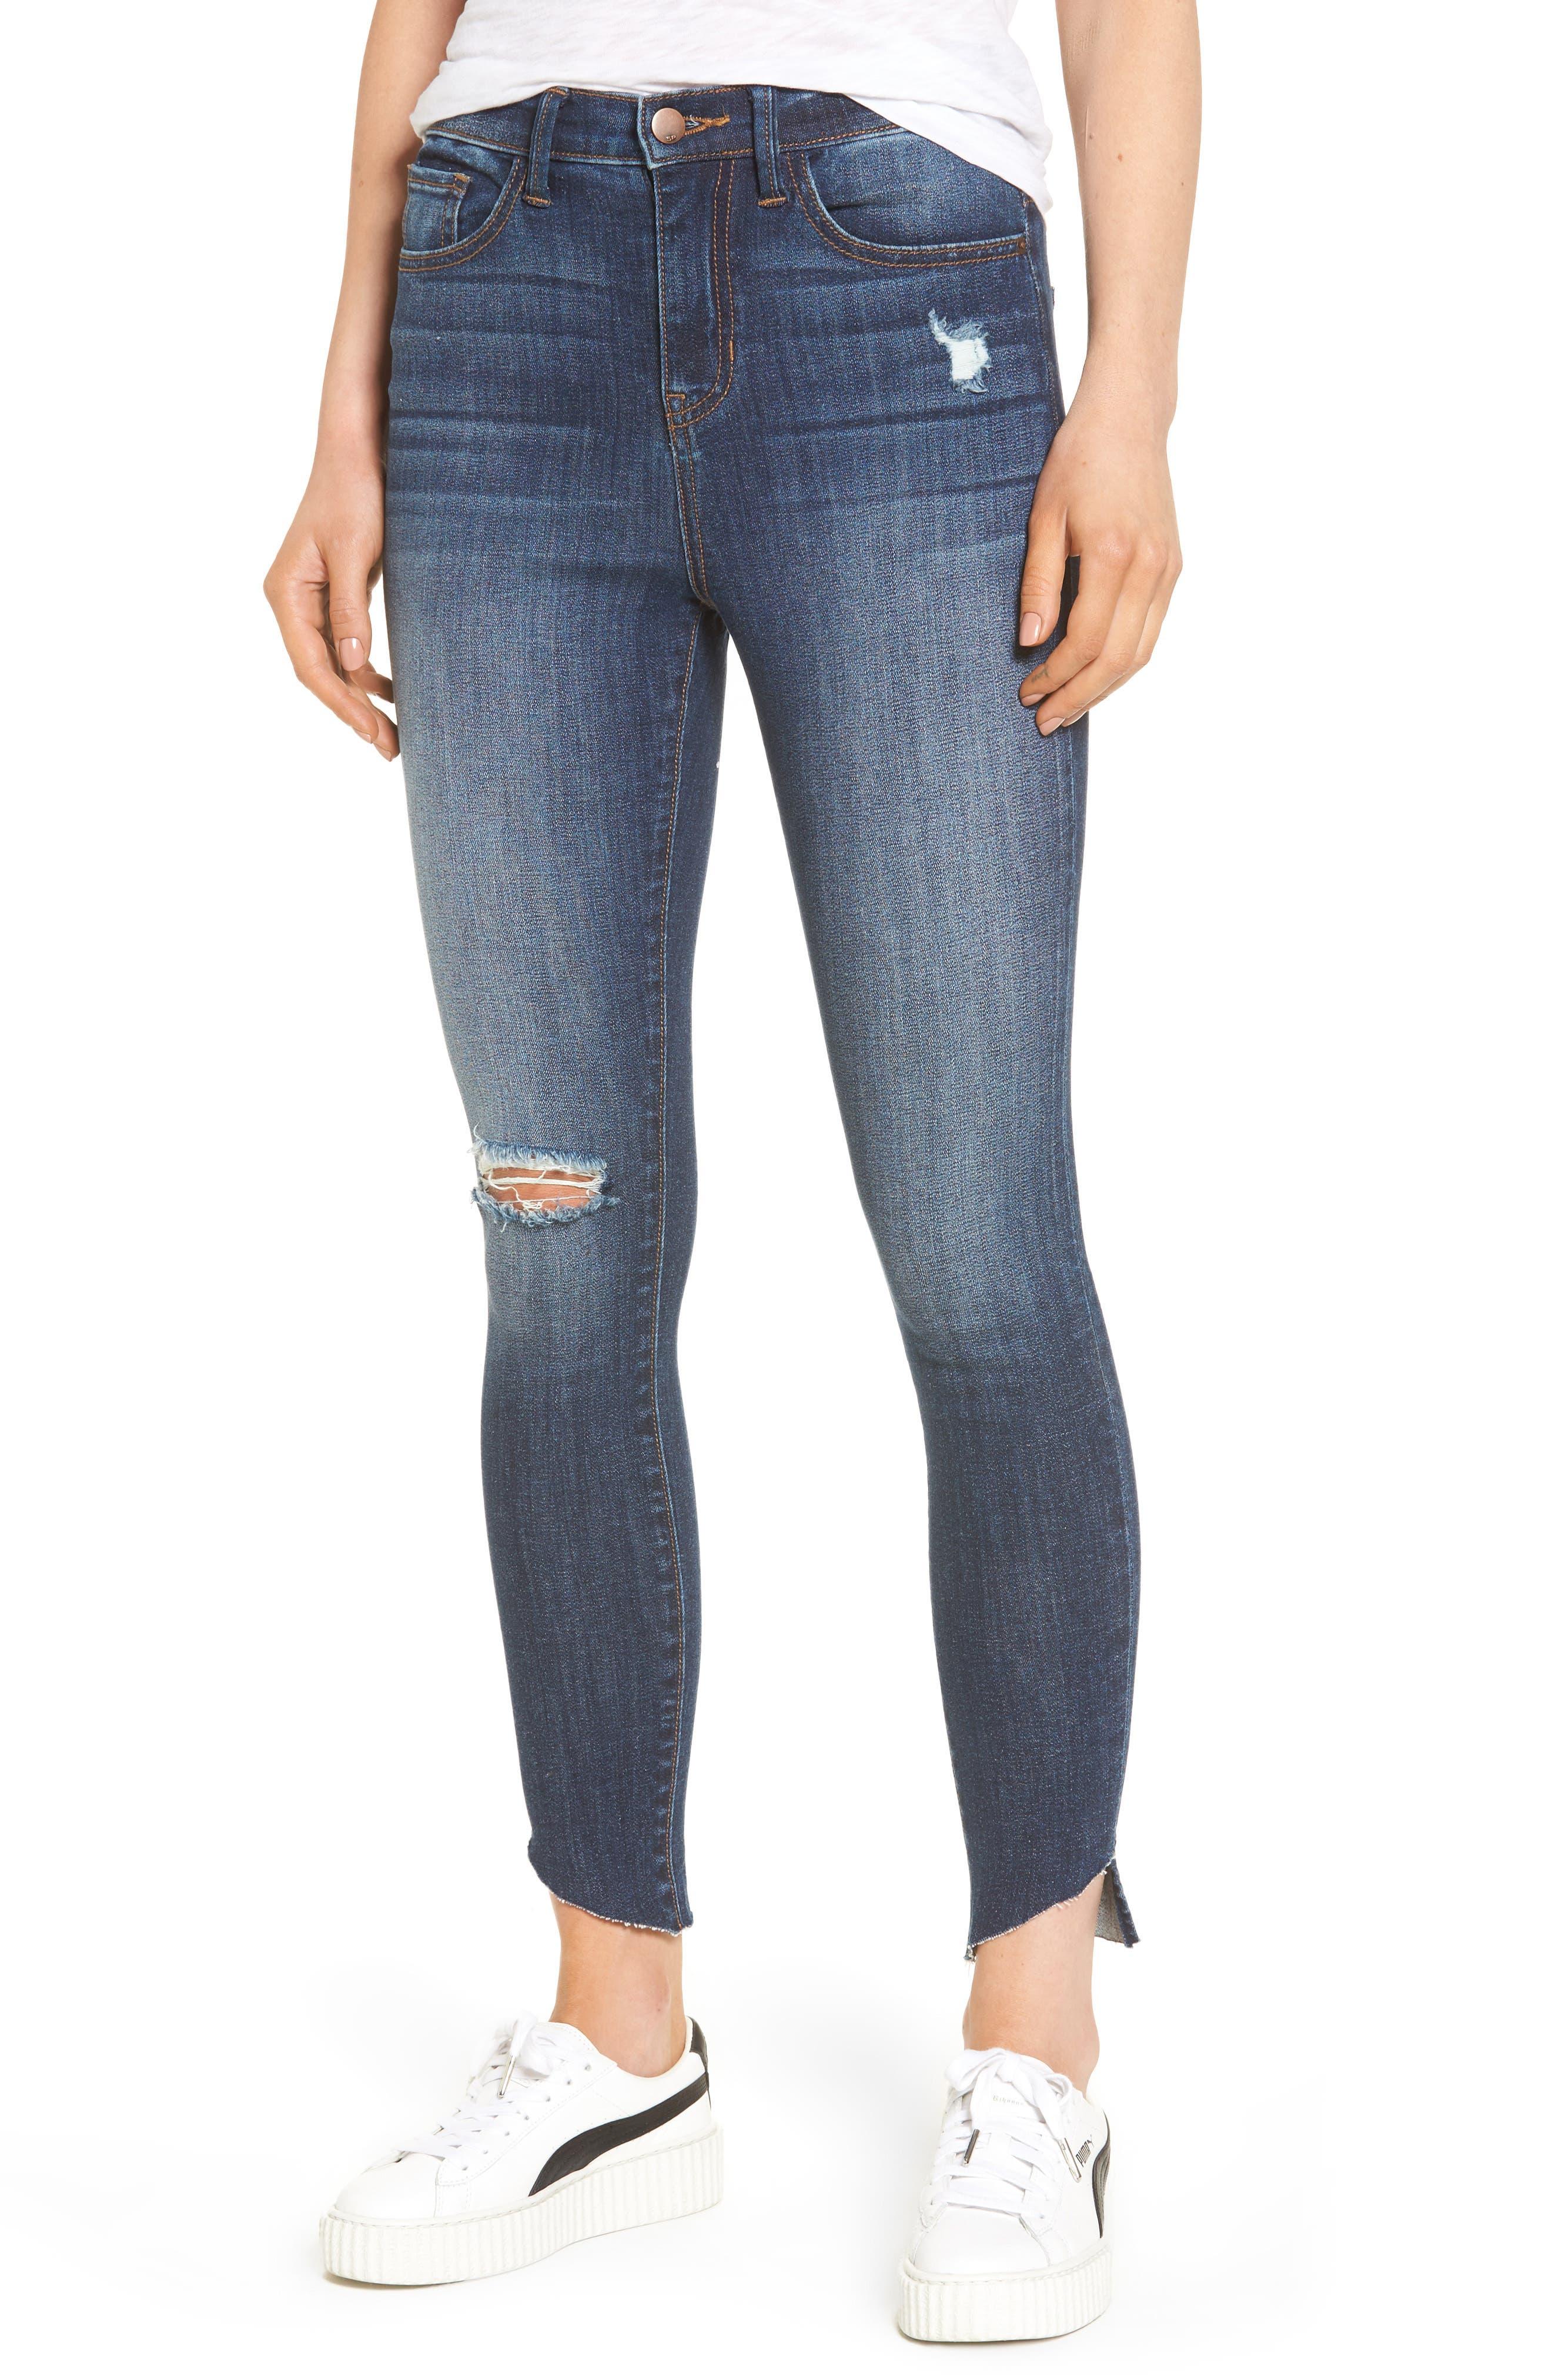 SP Black Angled Step Hem High Waist Skinny Jeans